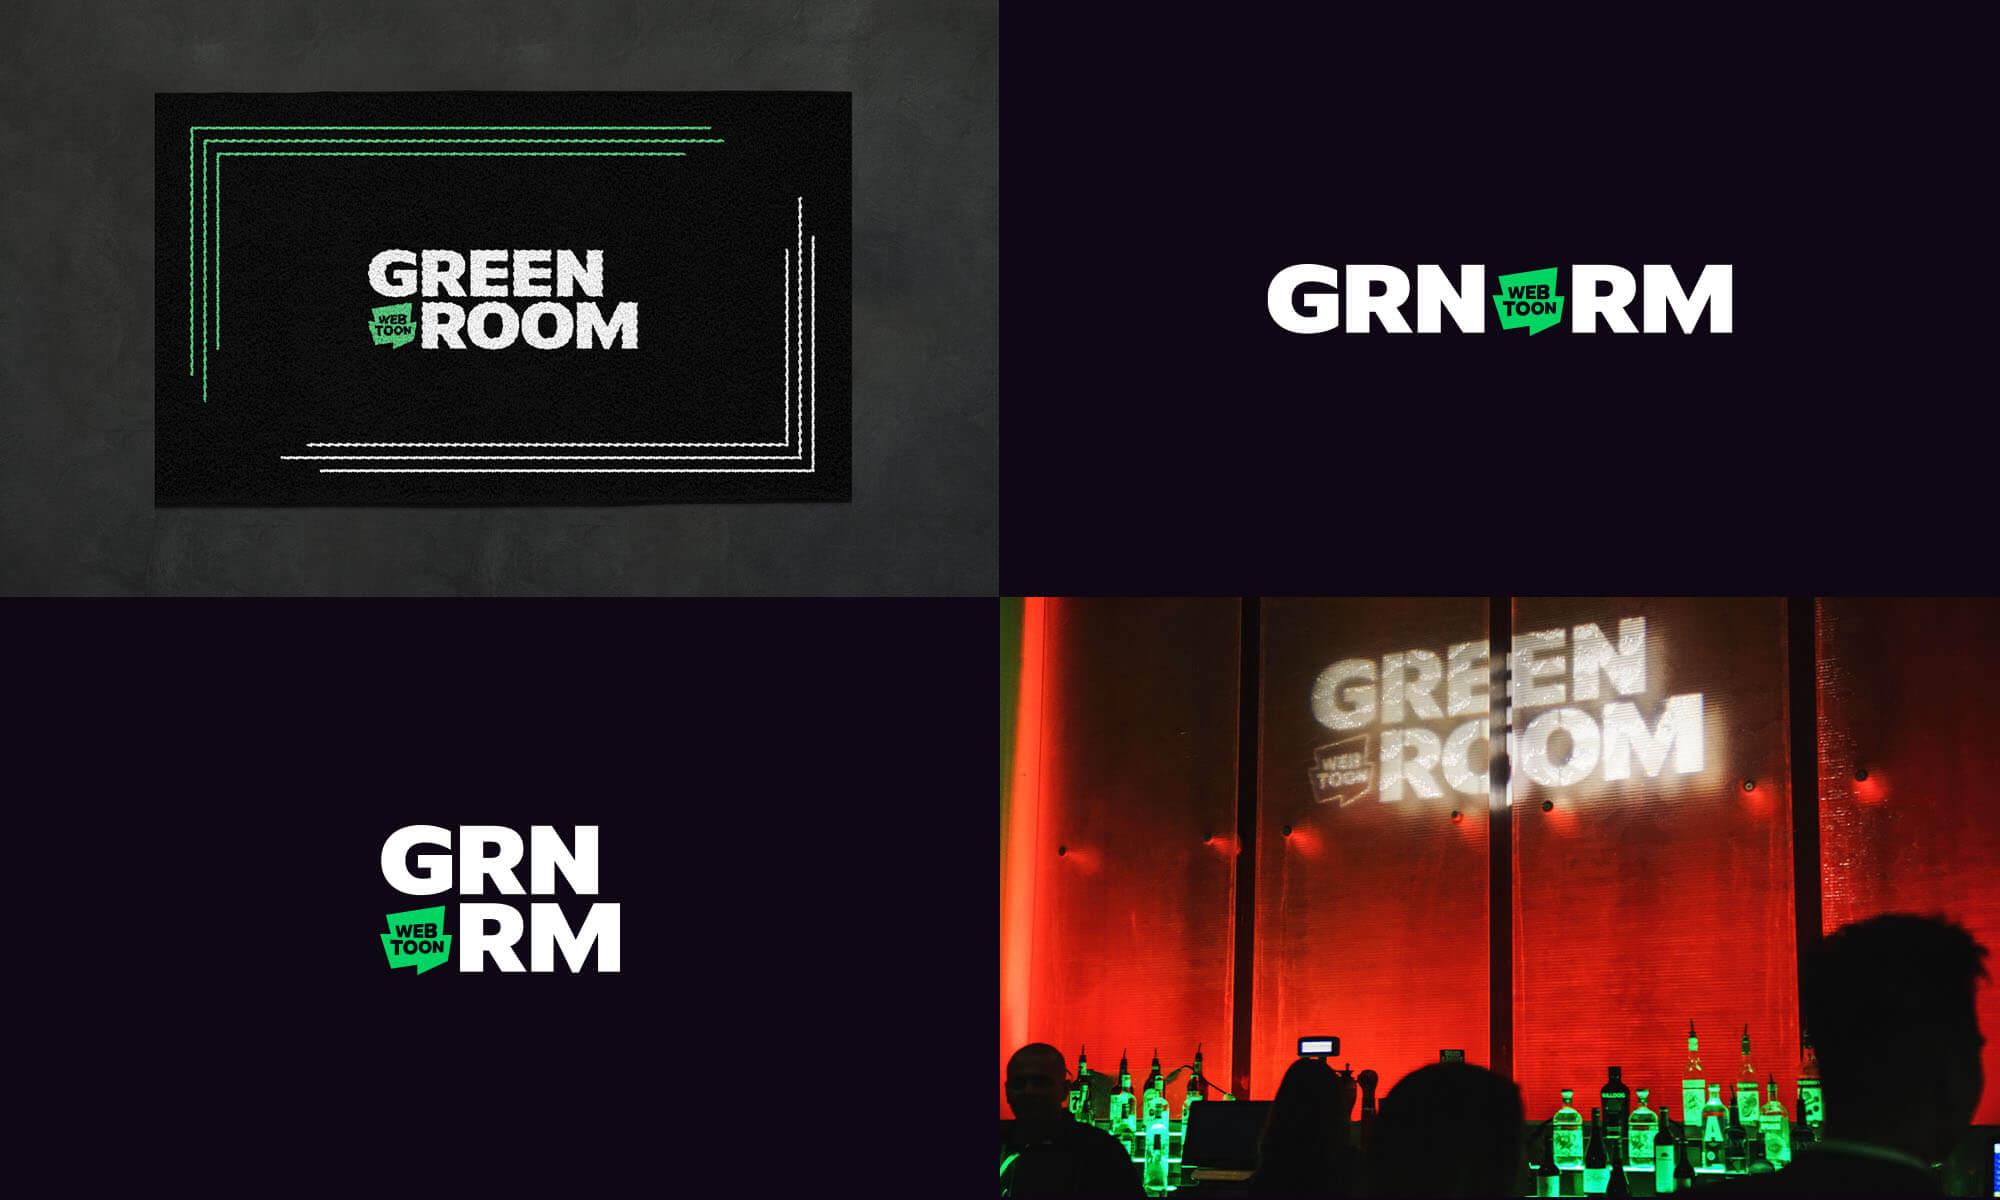 studio-malagon-green-room-brand-02.jpg